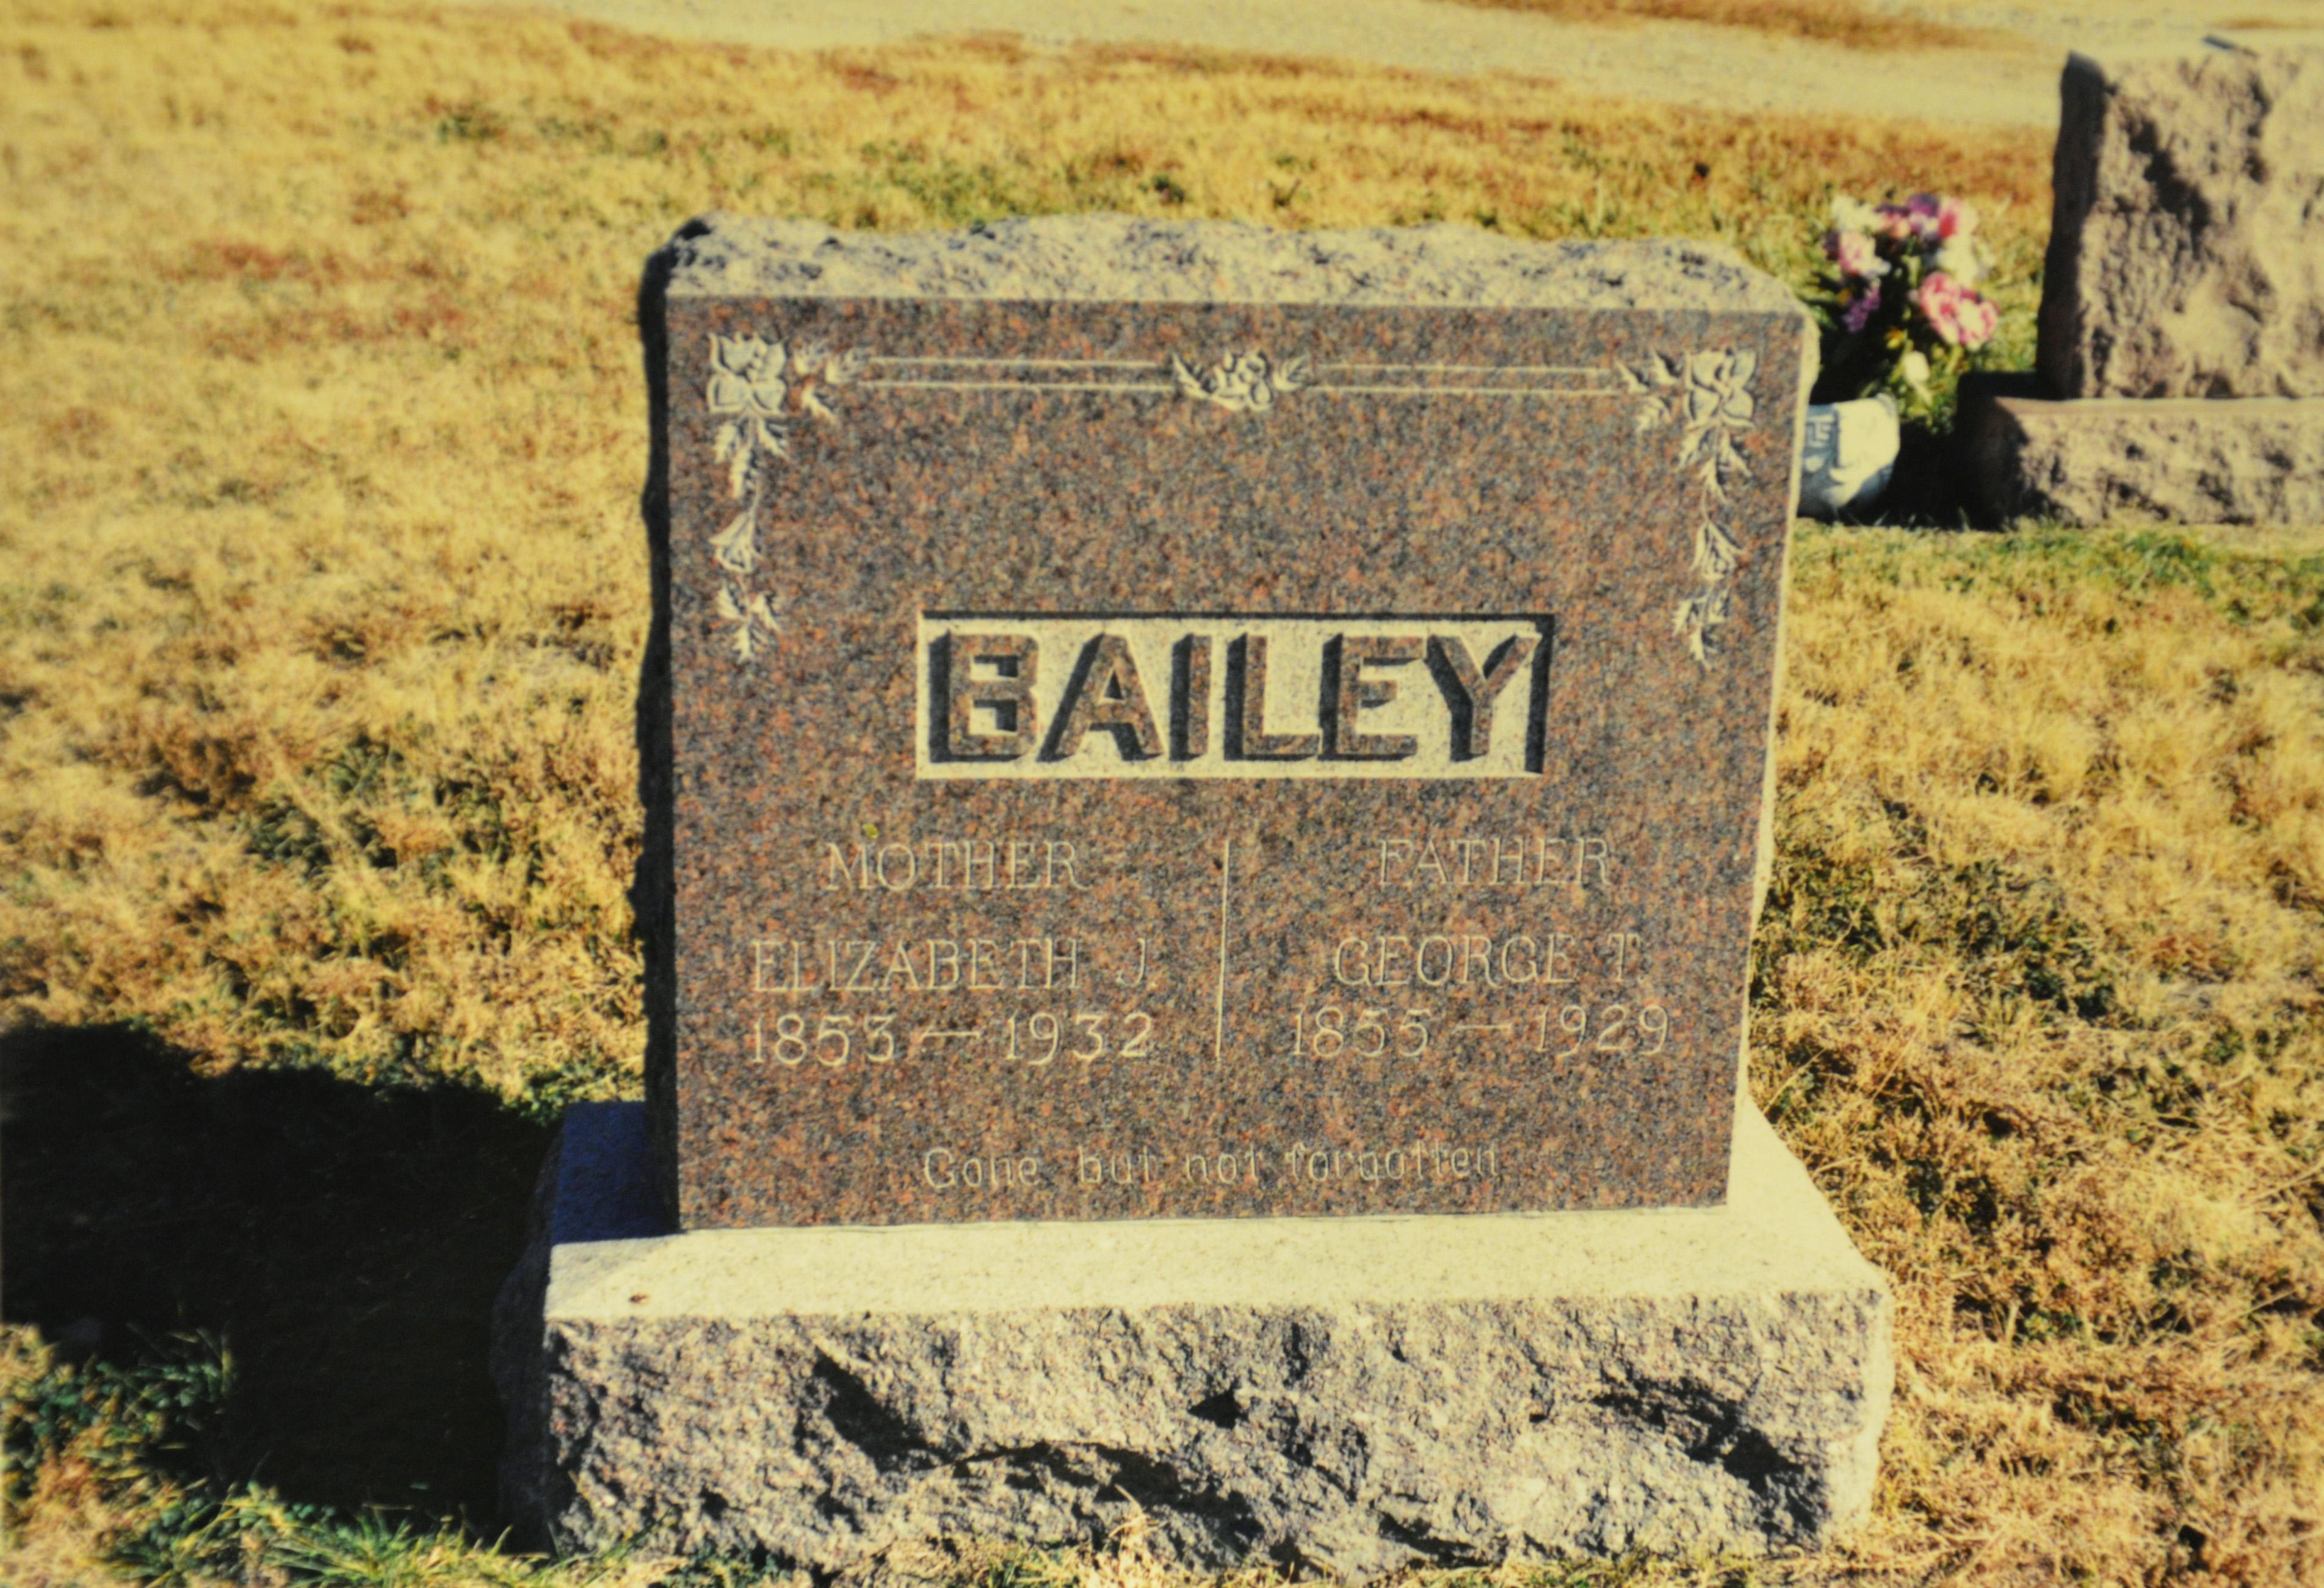 George Thomas Tom Bailey